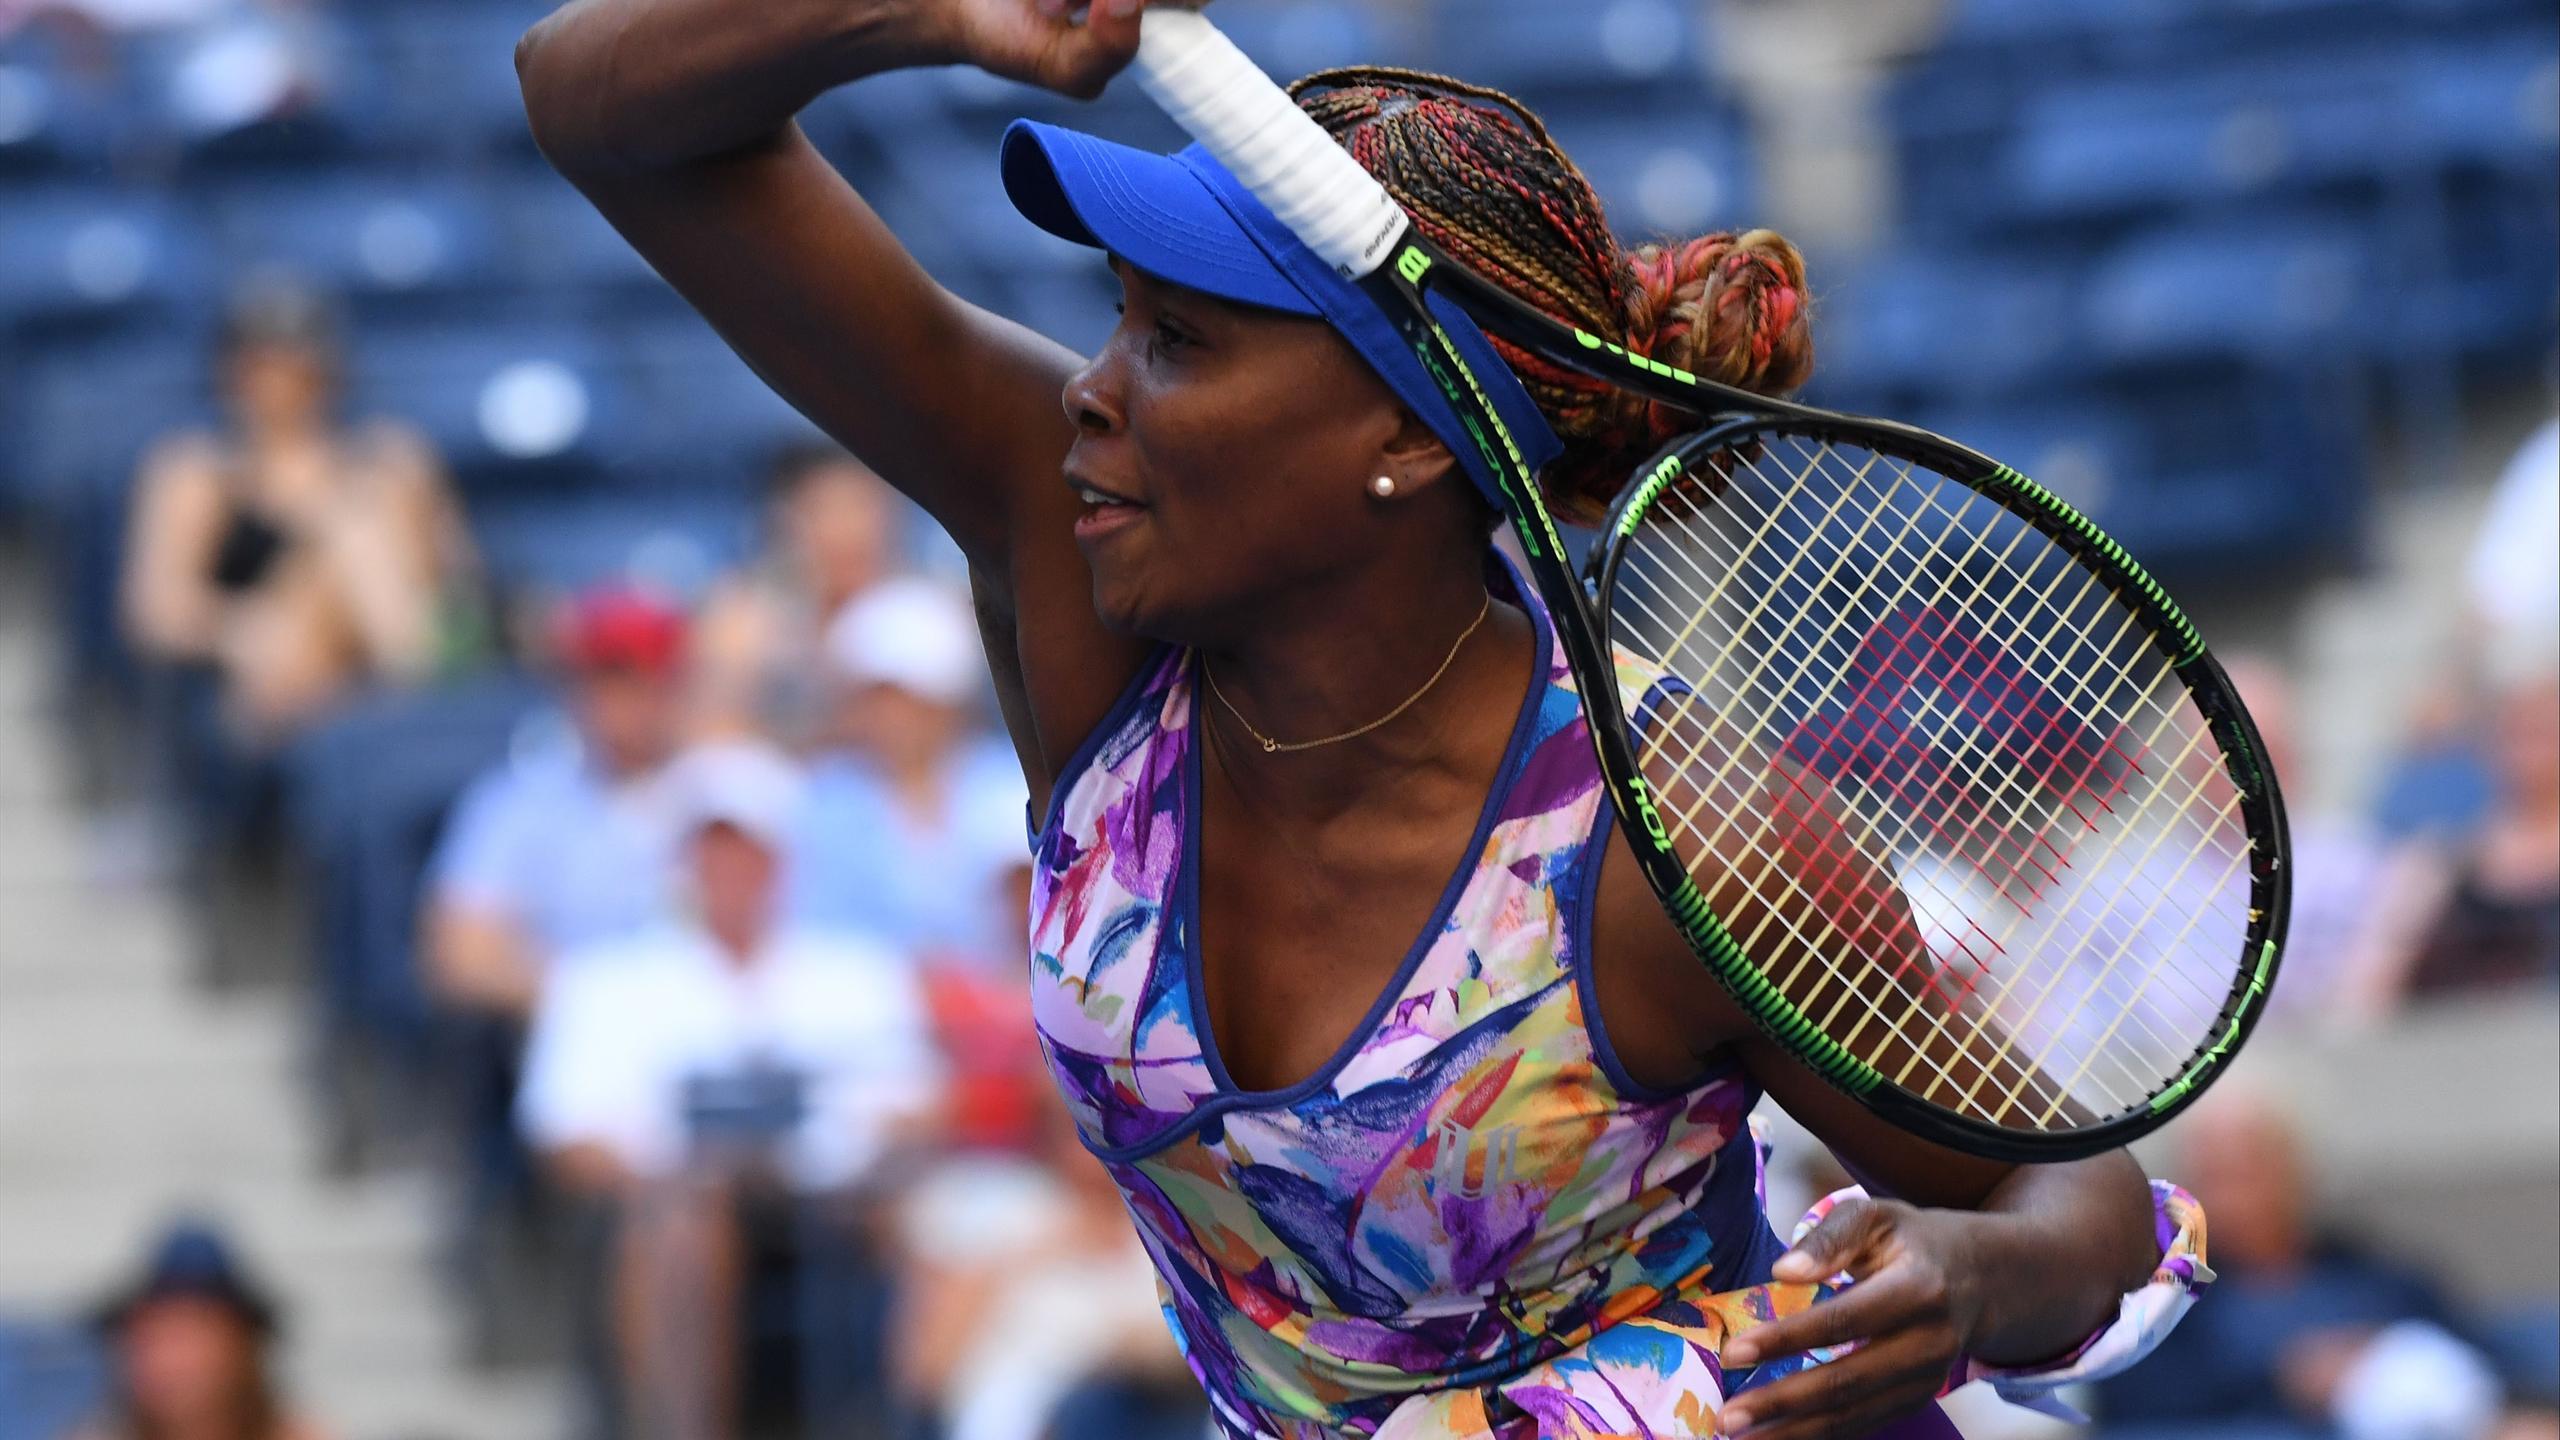 Venus Williams of the USA hits to Kateryna Kozlova of Ukraine